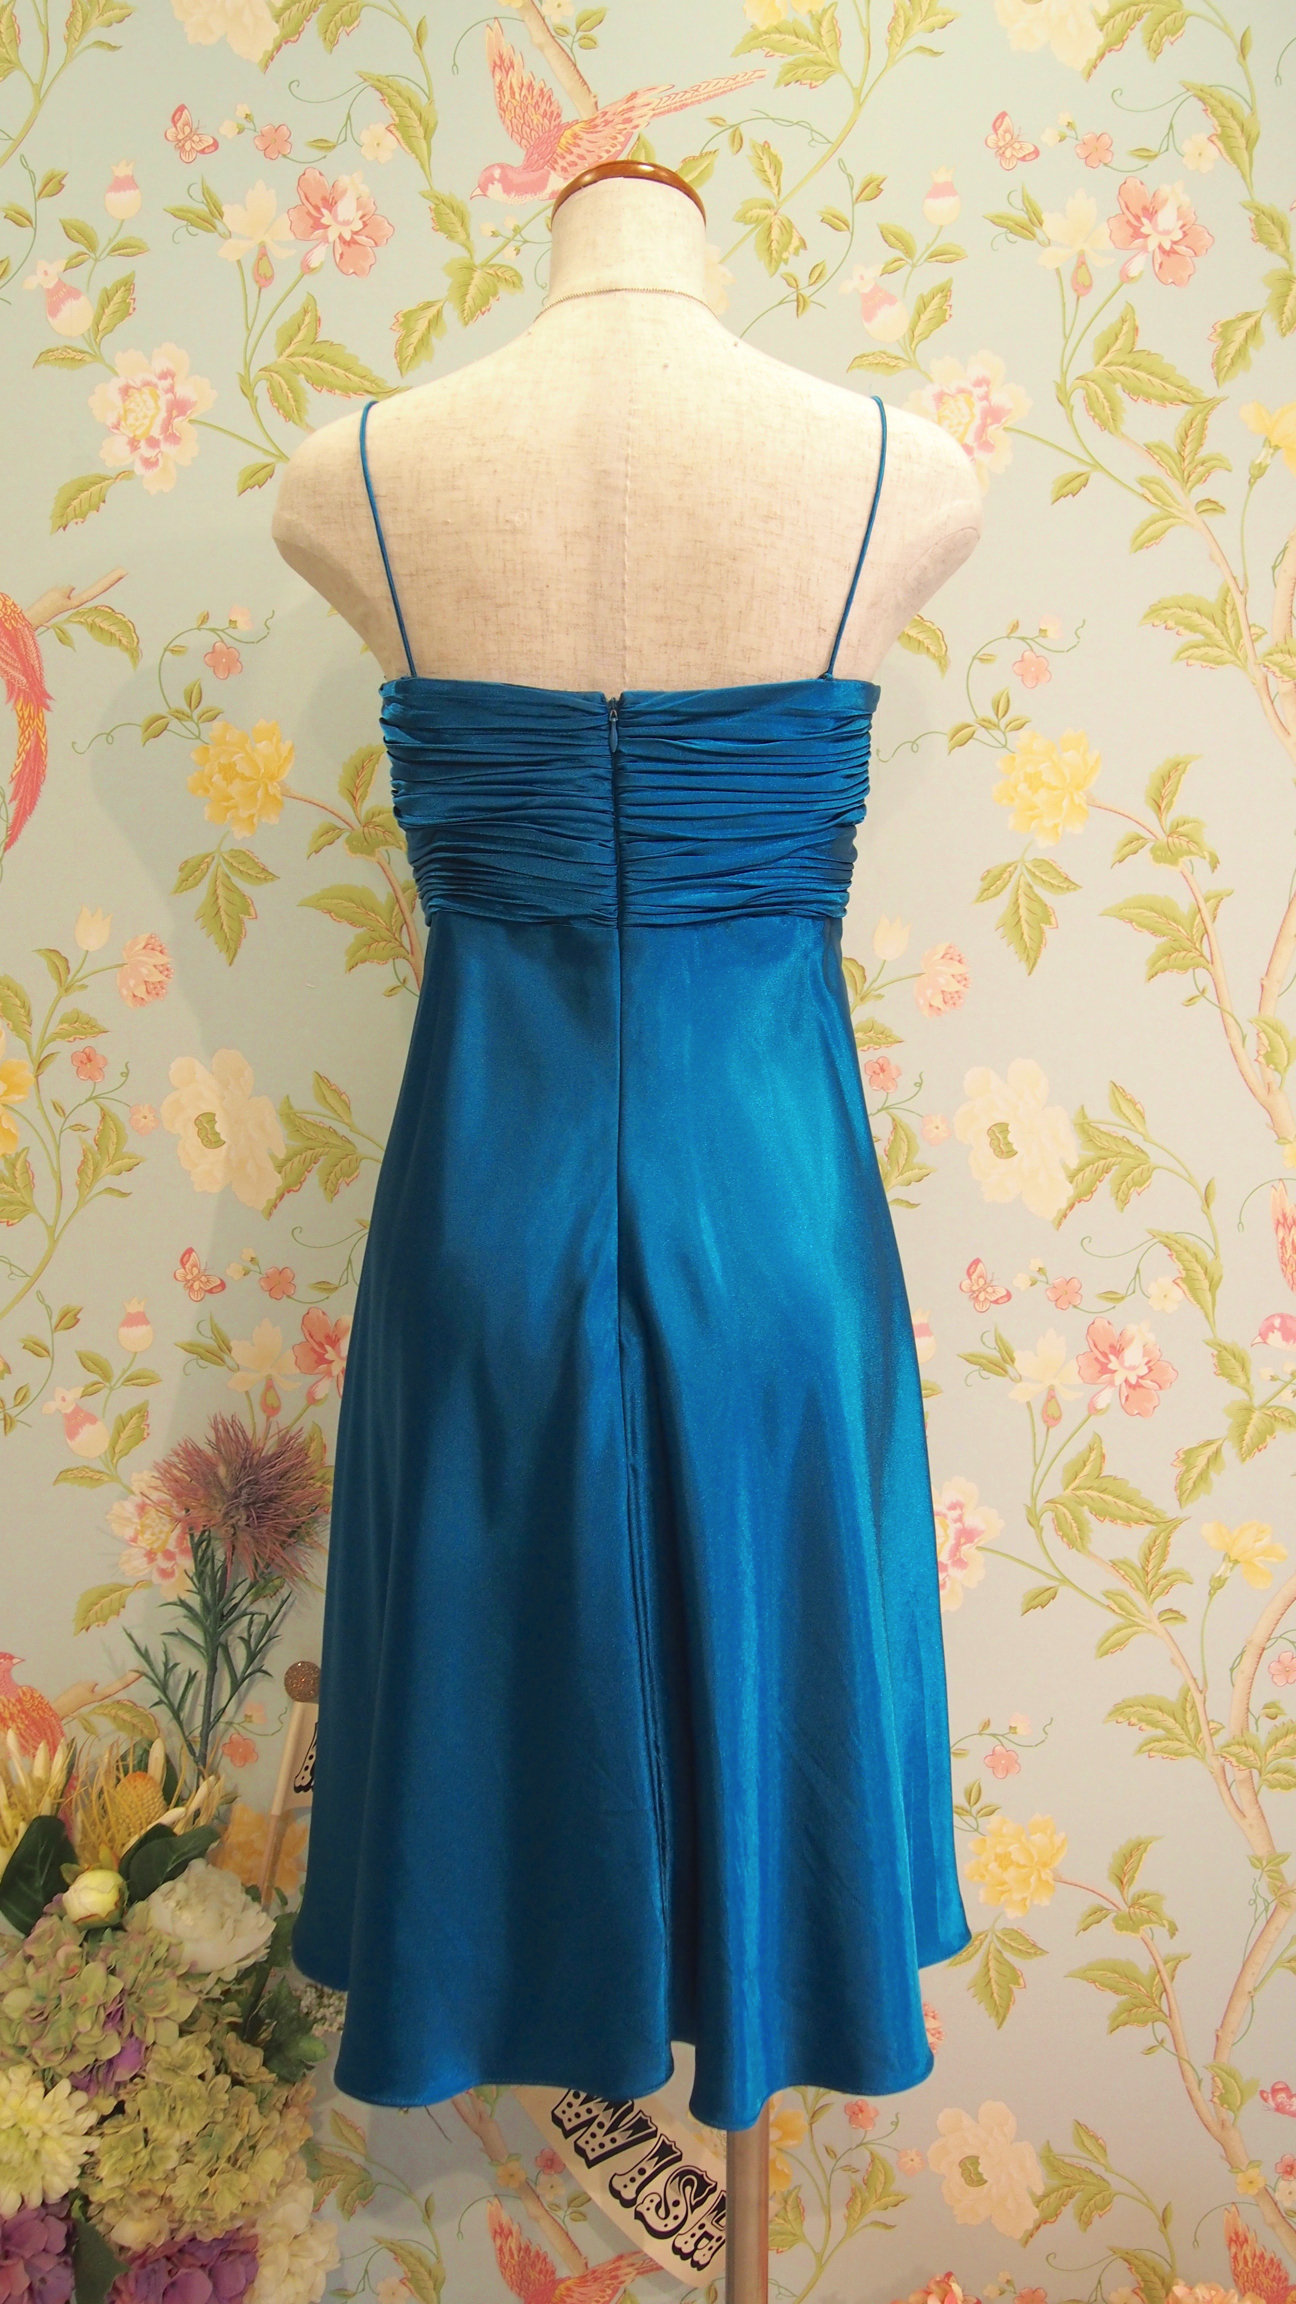 nr_dress_086